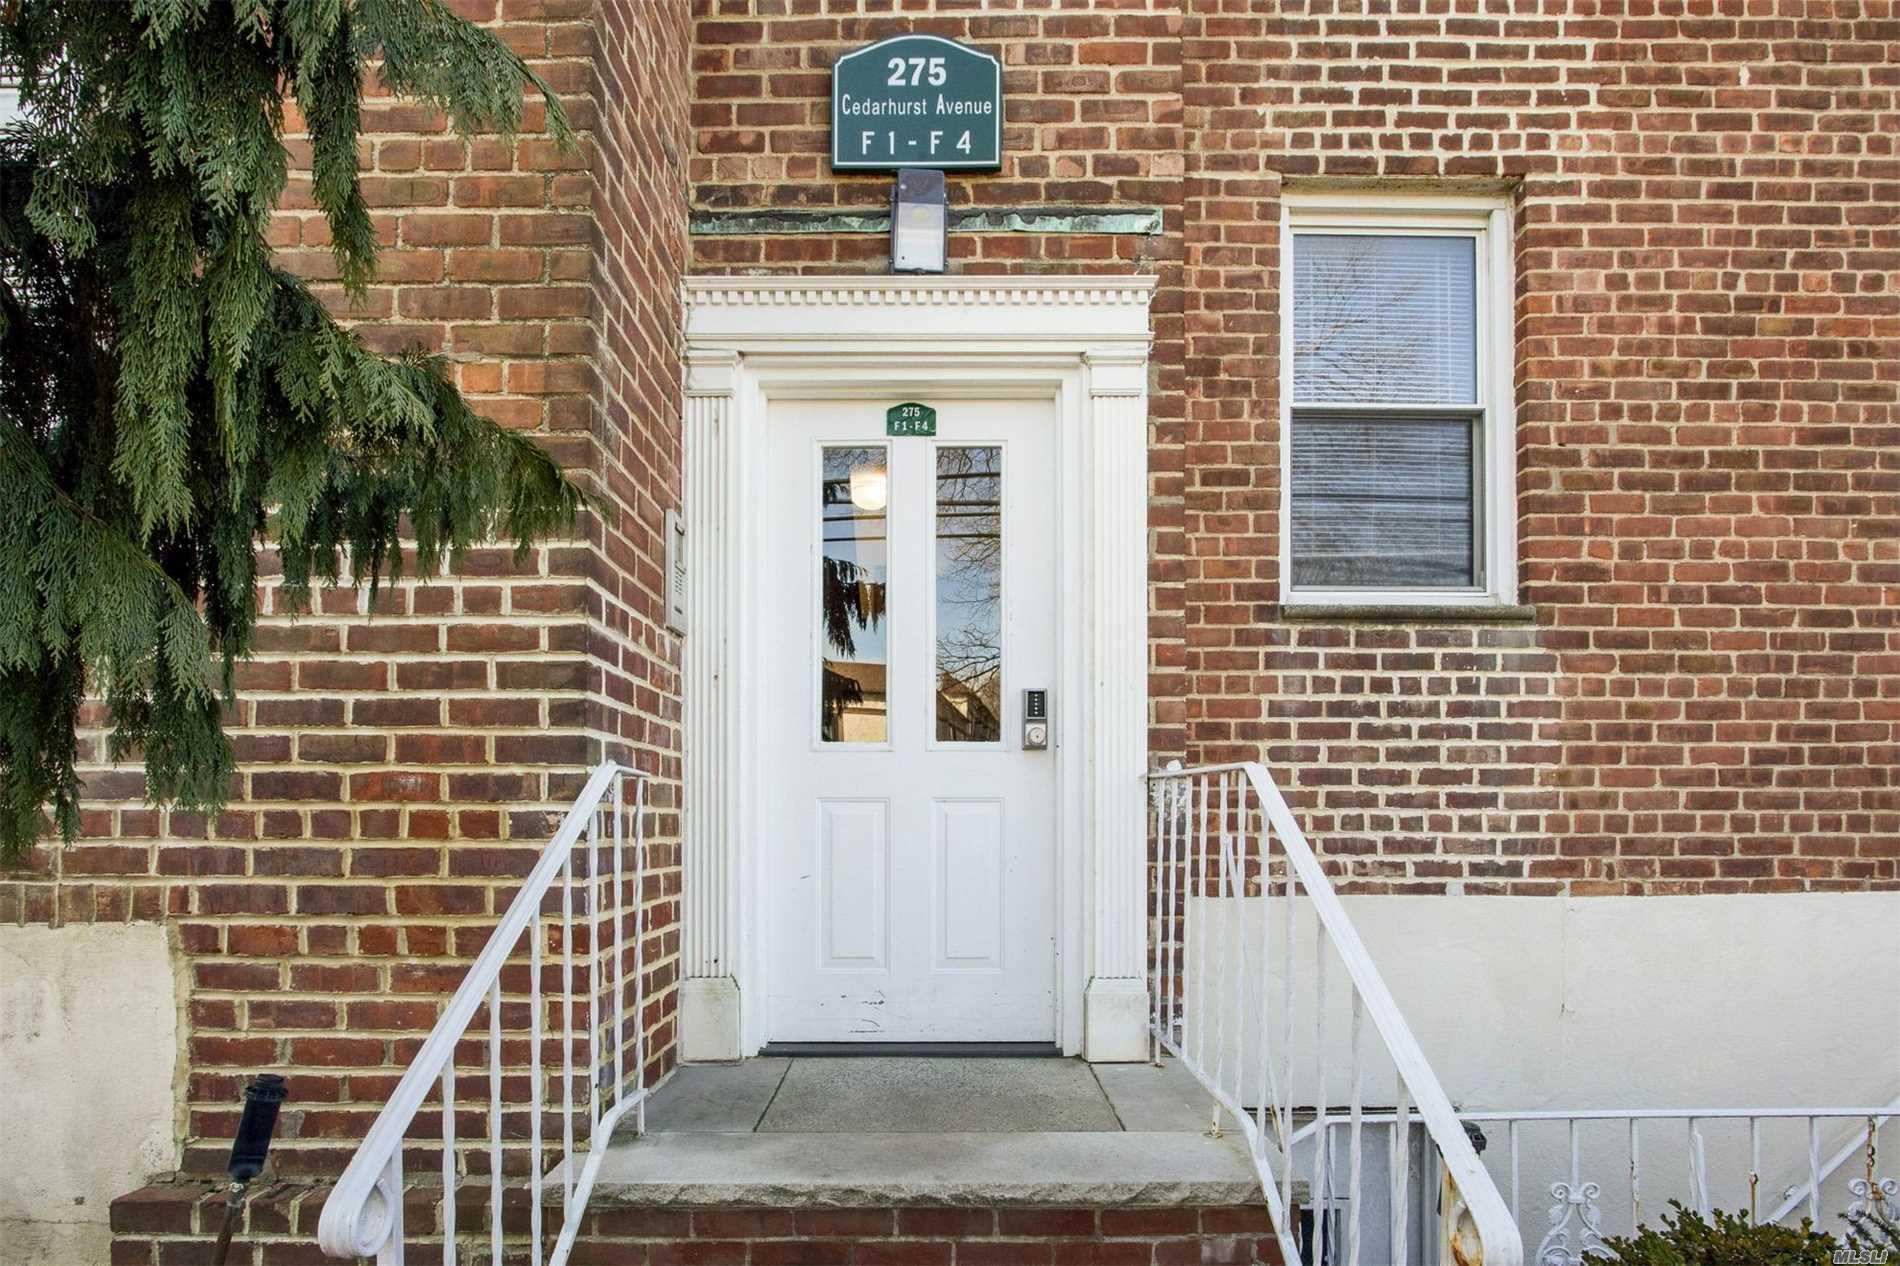 275 Cedarhurst Ave, F 1 - Cedarhurst, New York